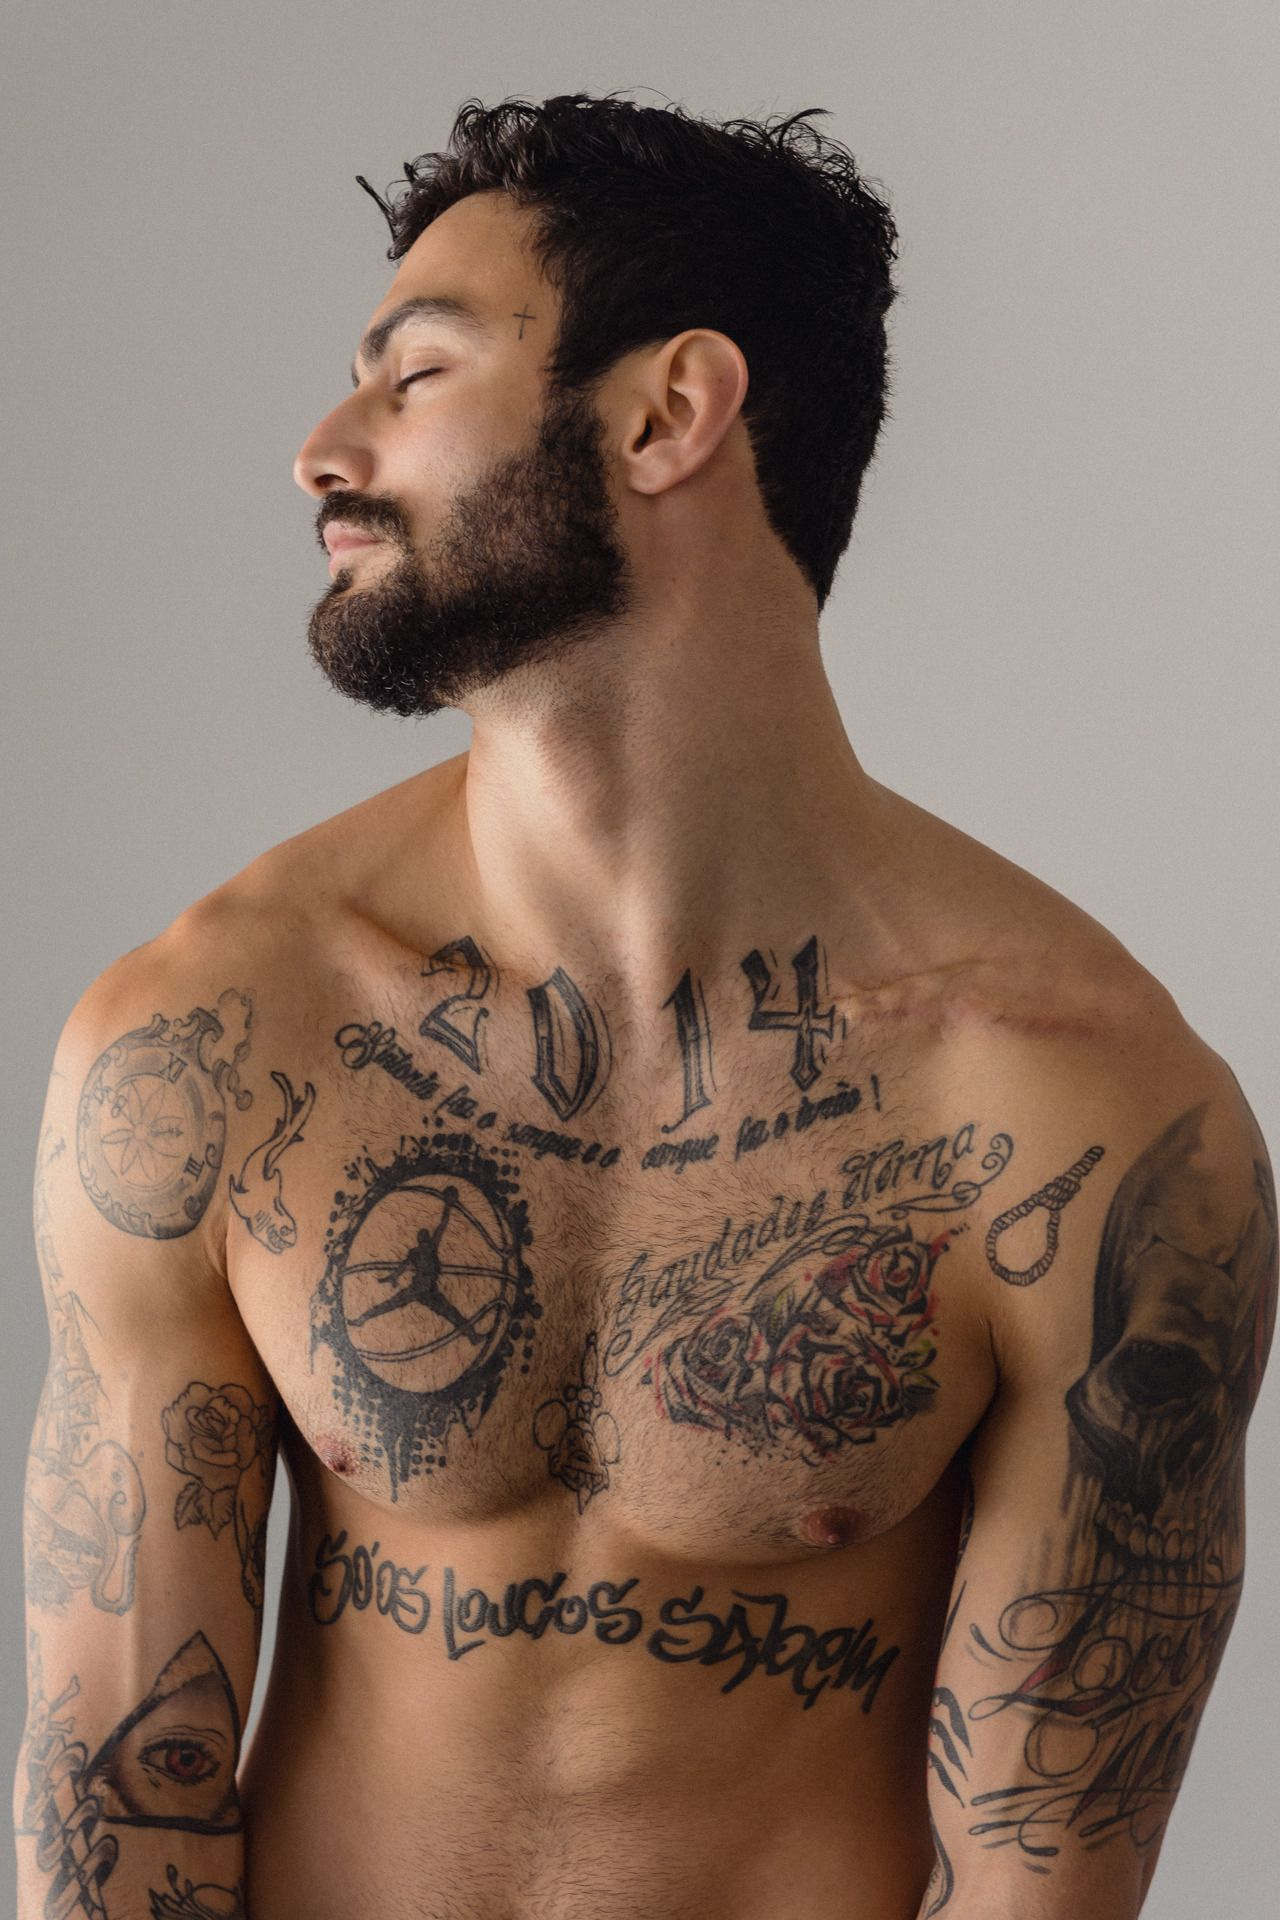 Lesbians Tattoos For Guys, Attractive Men, Male Models, Hairy Men,  Beautiful Men